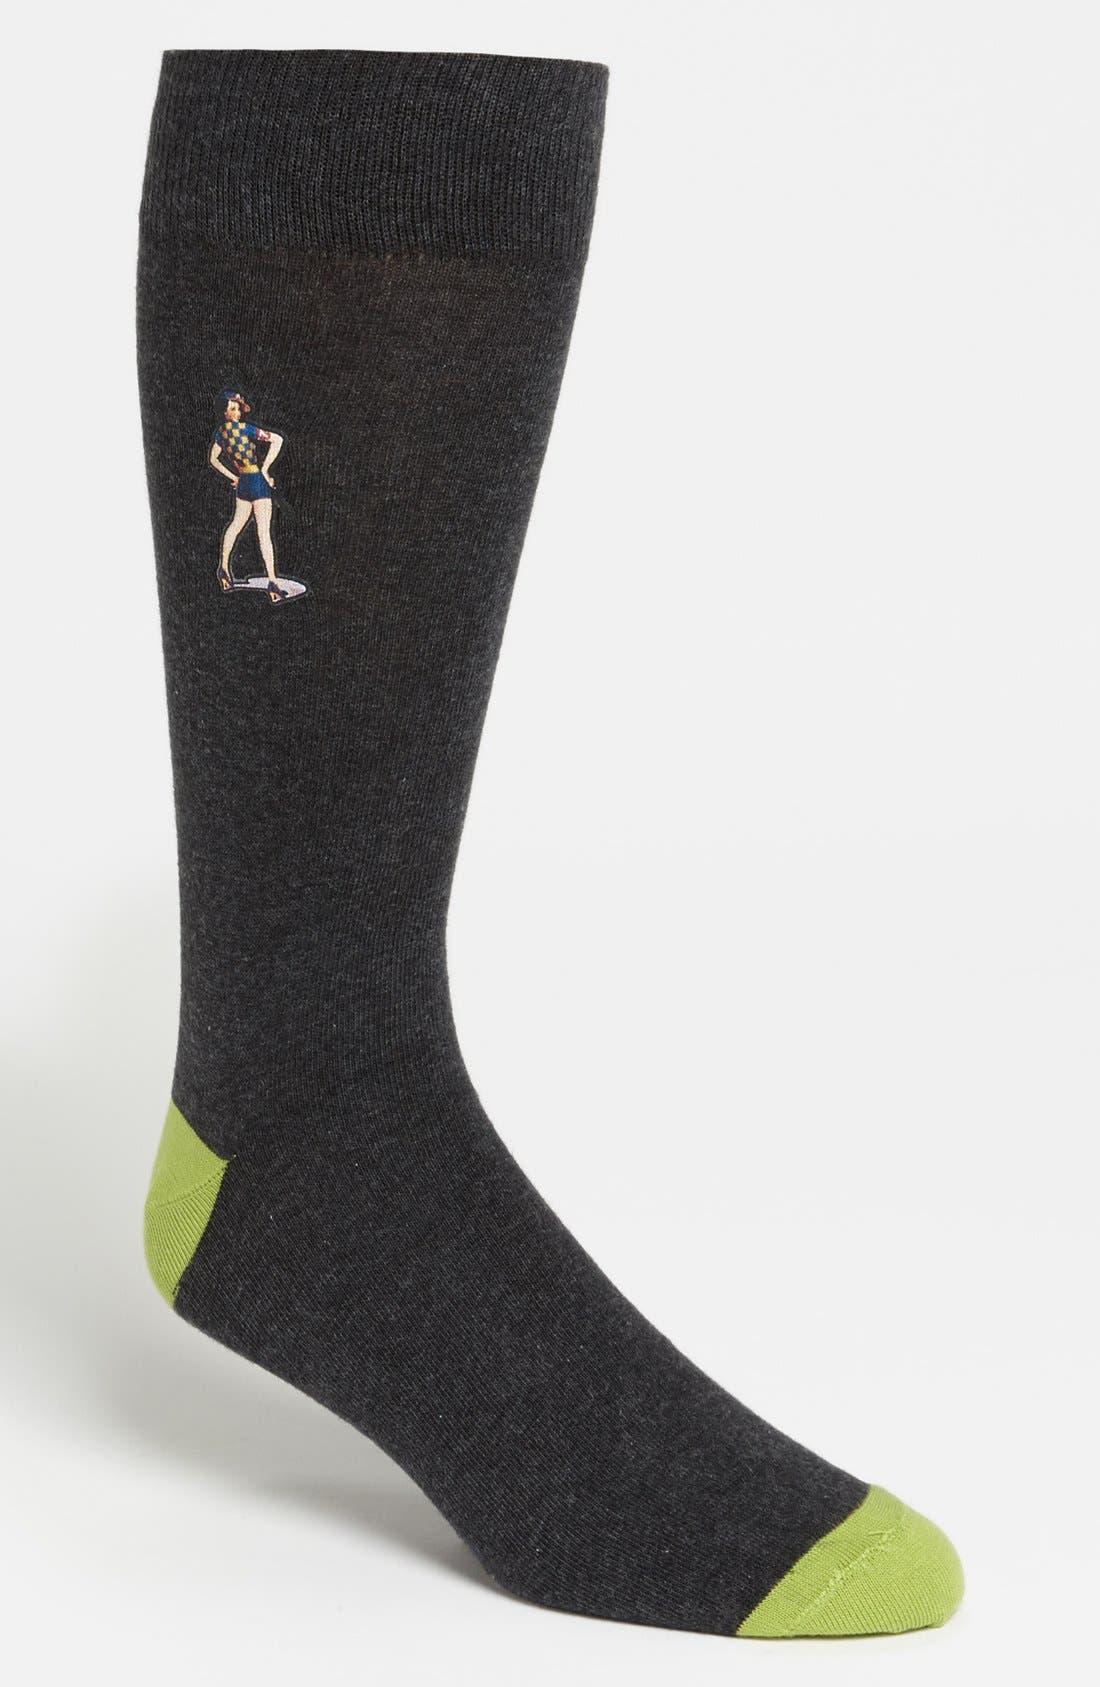 Alternate Image 1 Selected - Lorenzo Uomo 'Pinup Girl' Socks